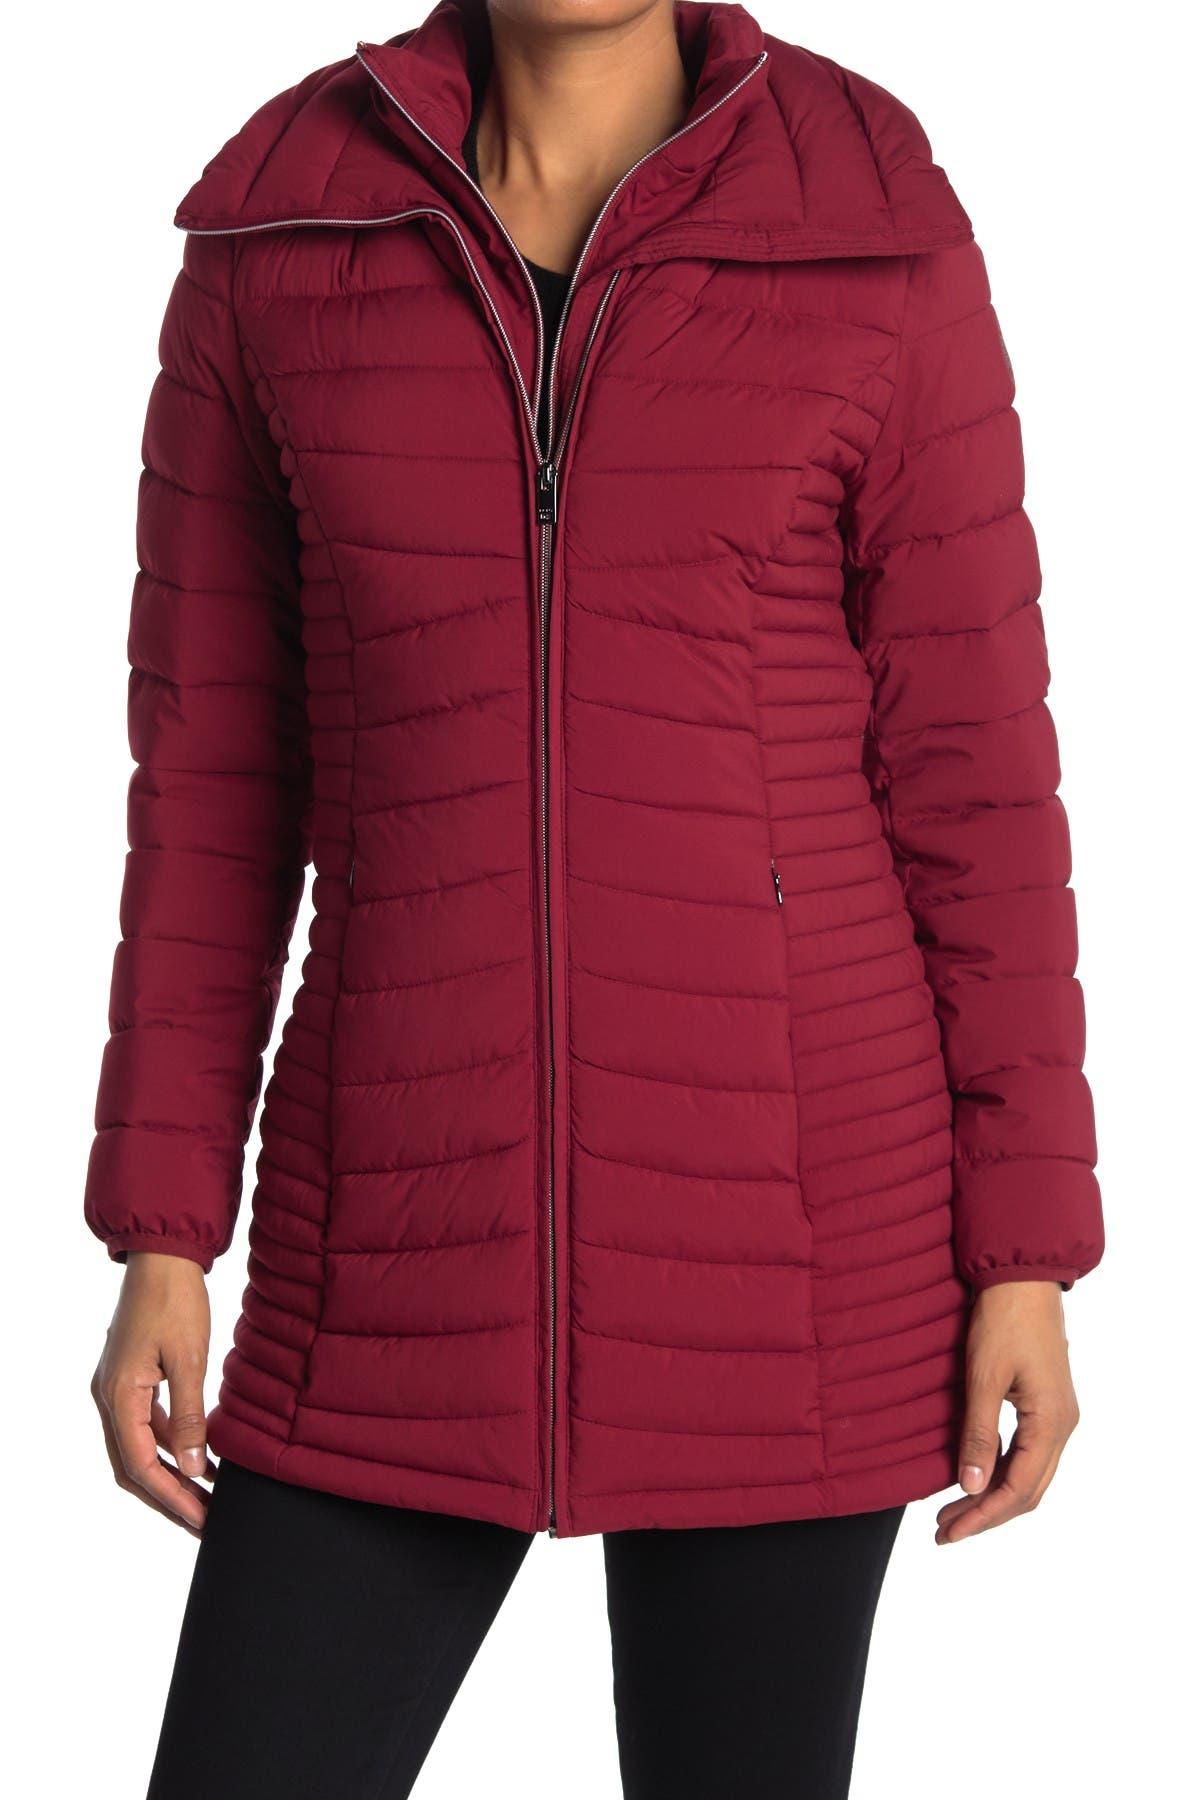 Image of DKNY Puffer Jacket